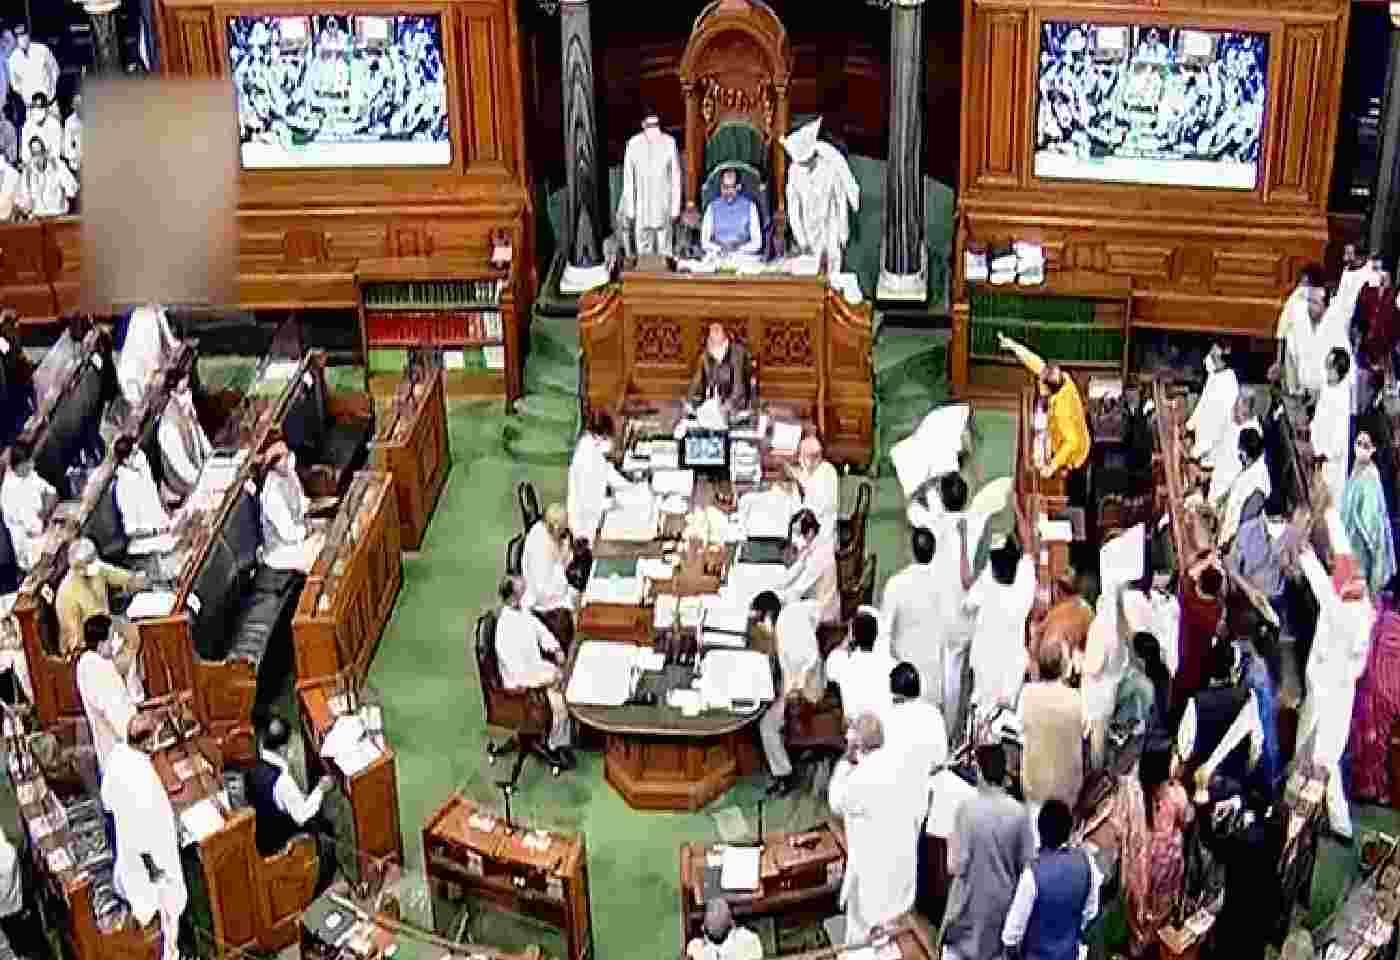 lok sabha rajya sabha Parliament Session adjourned for second time till 2 pm amid opposition uproar